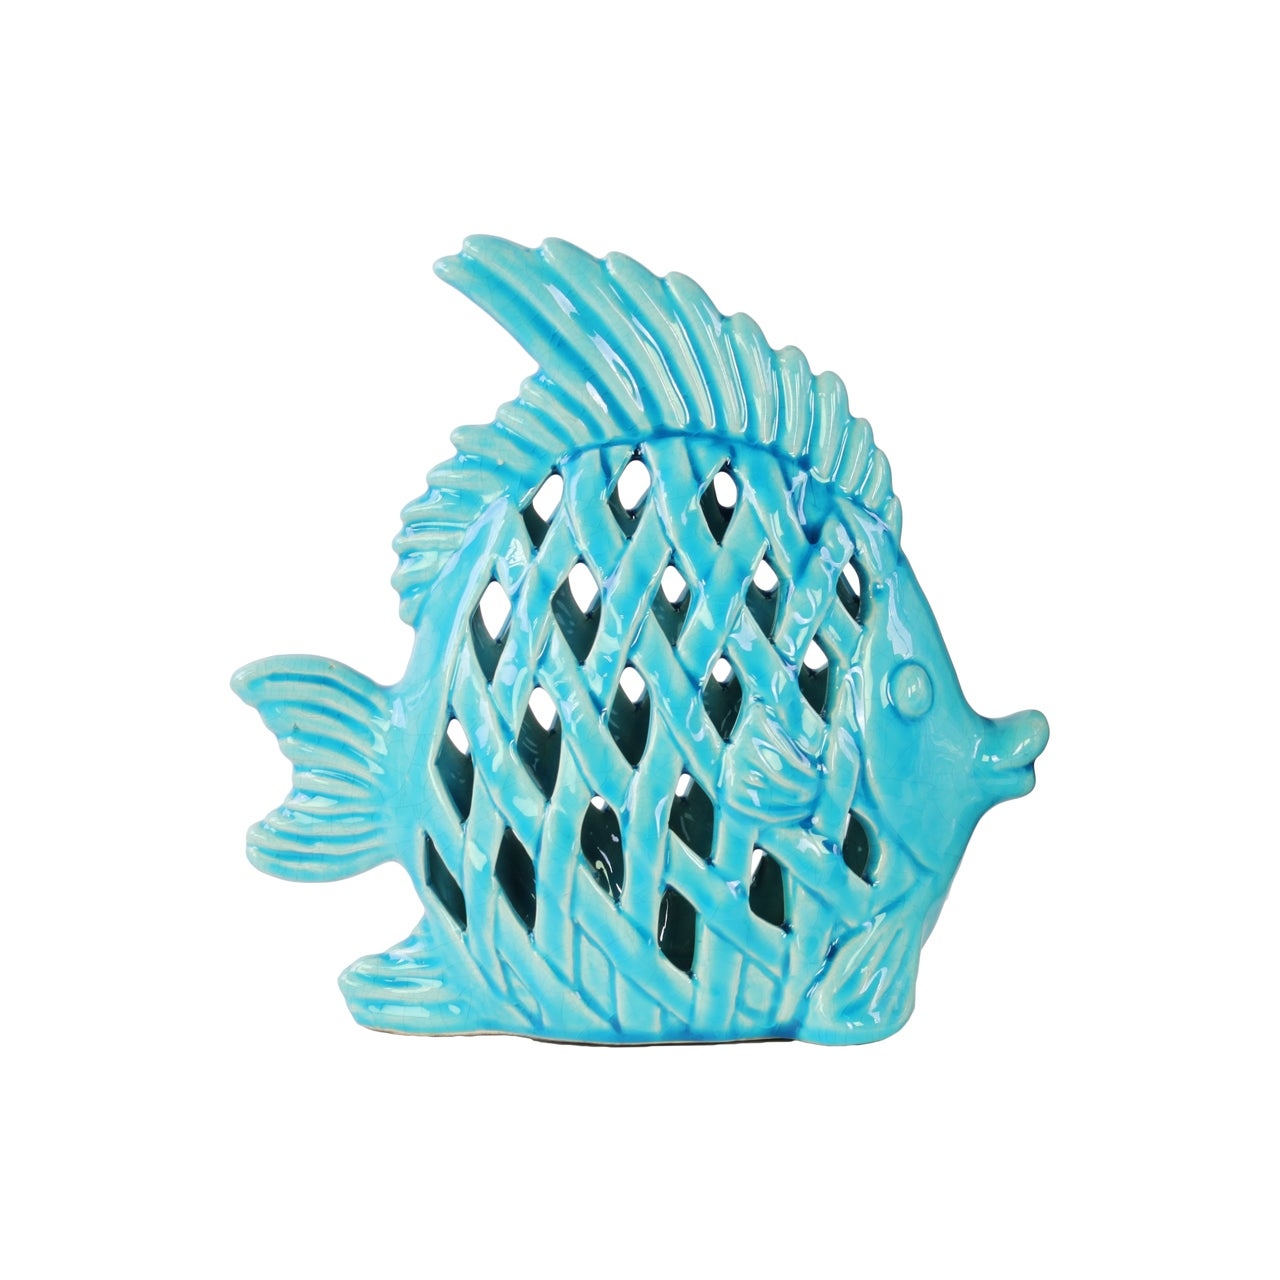 Urban Trend Glossy Turquoise Finish Ceramic Lattice Cutou...